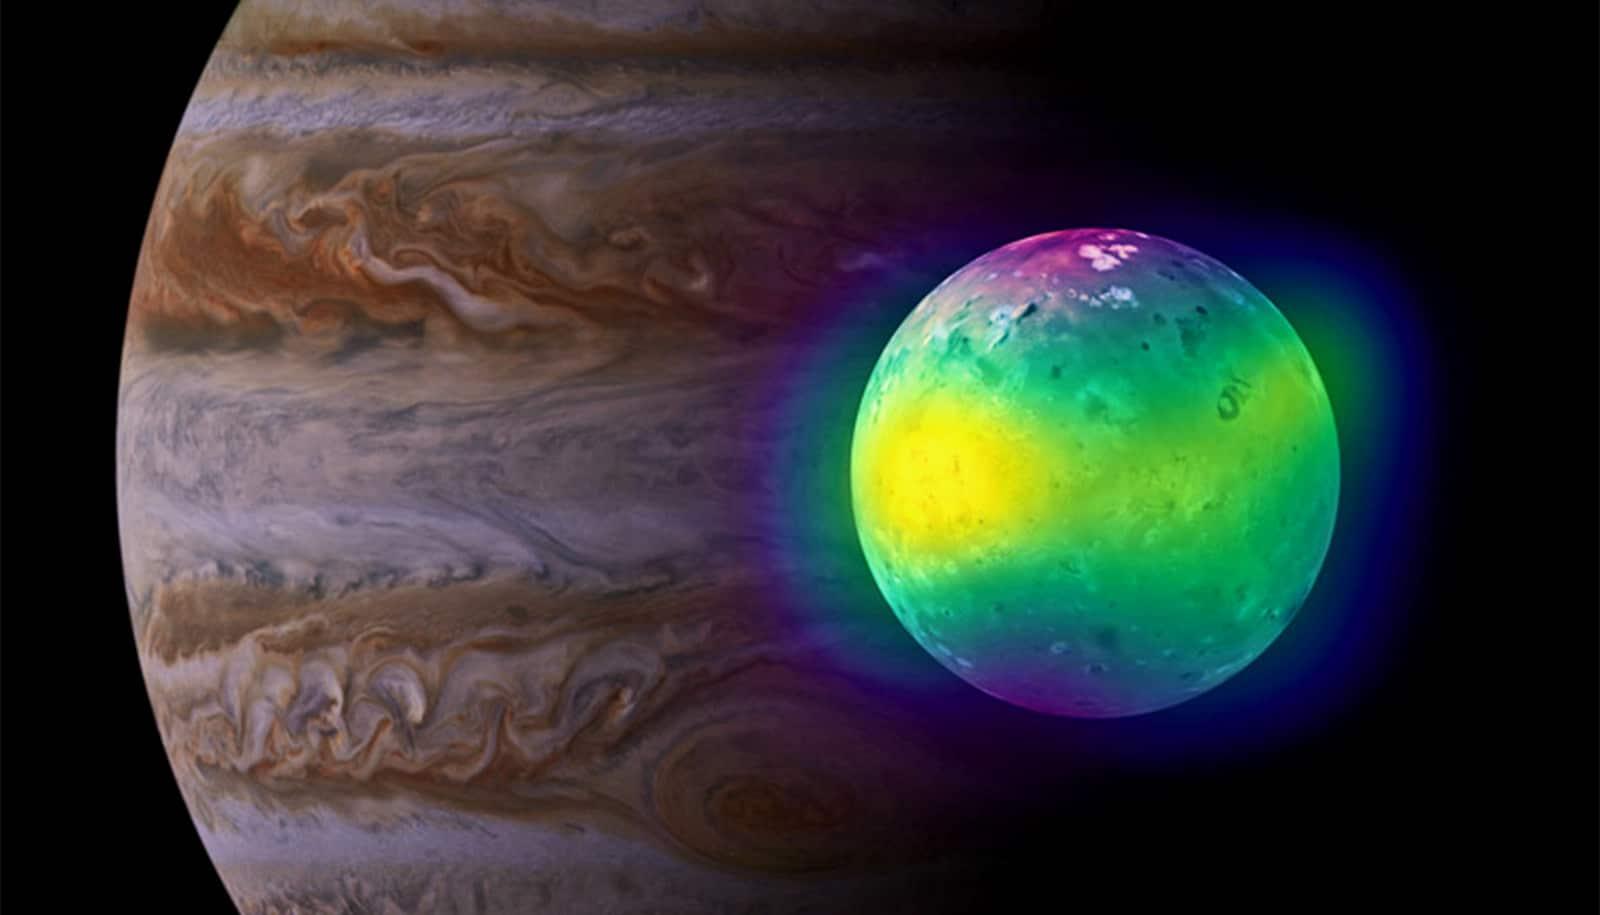 Volcanoes feed the atmosphere on Jupiter's moon Io - Futurity